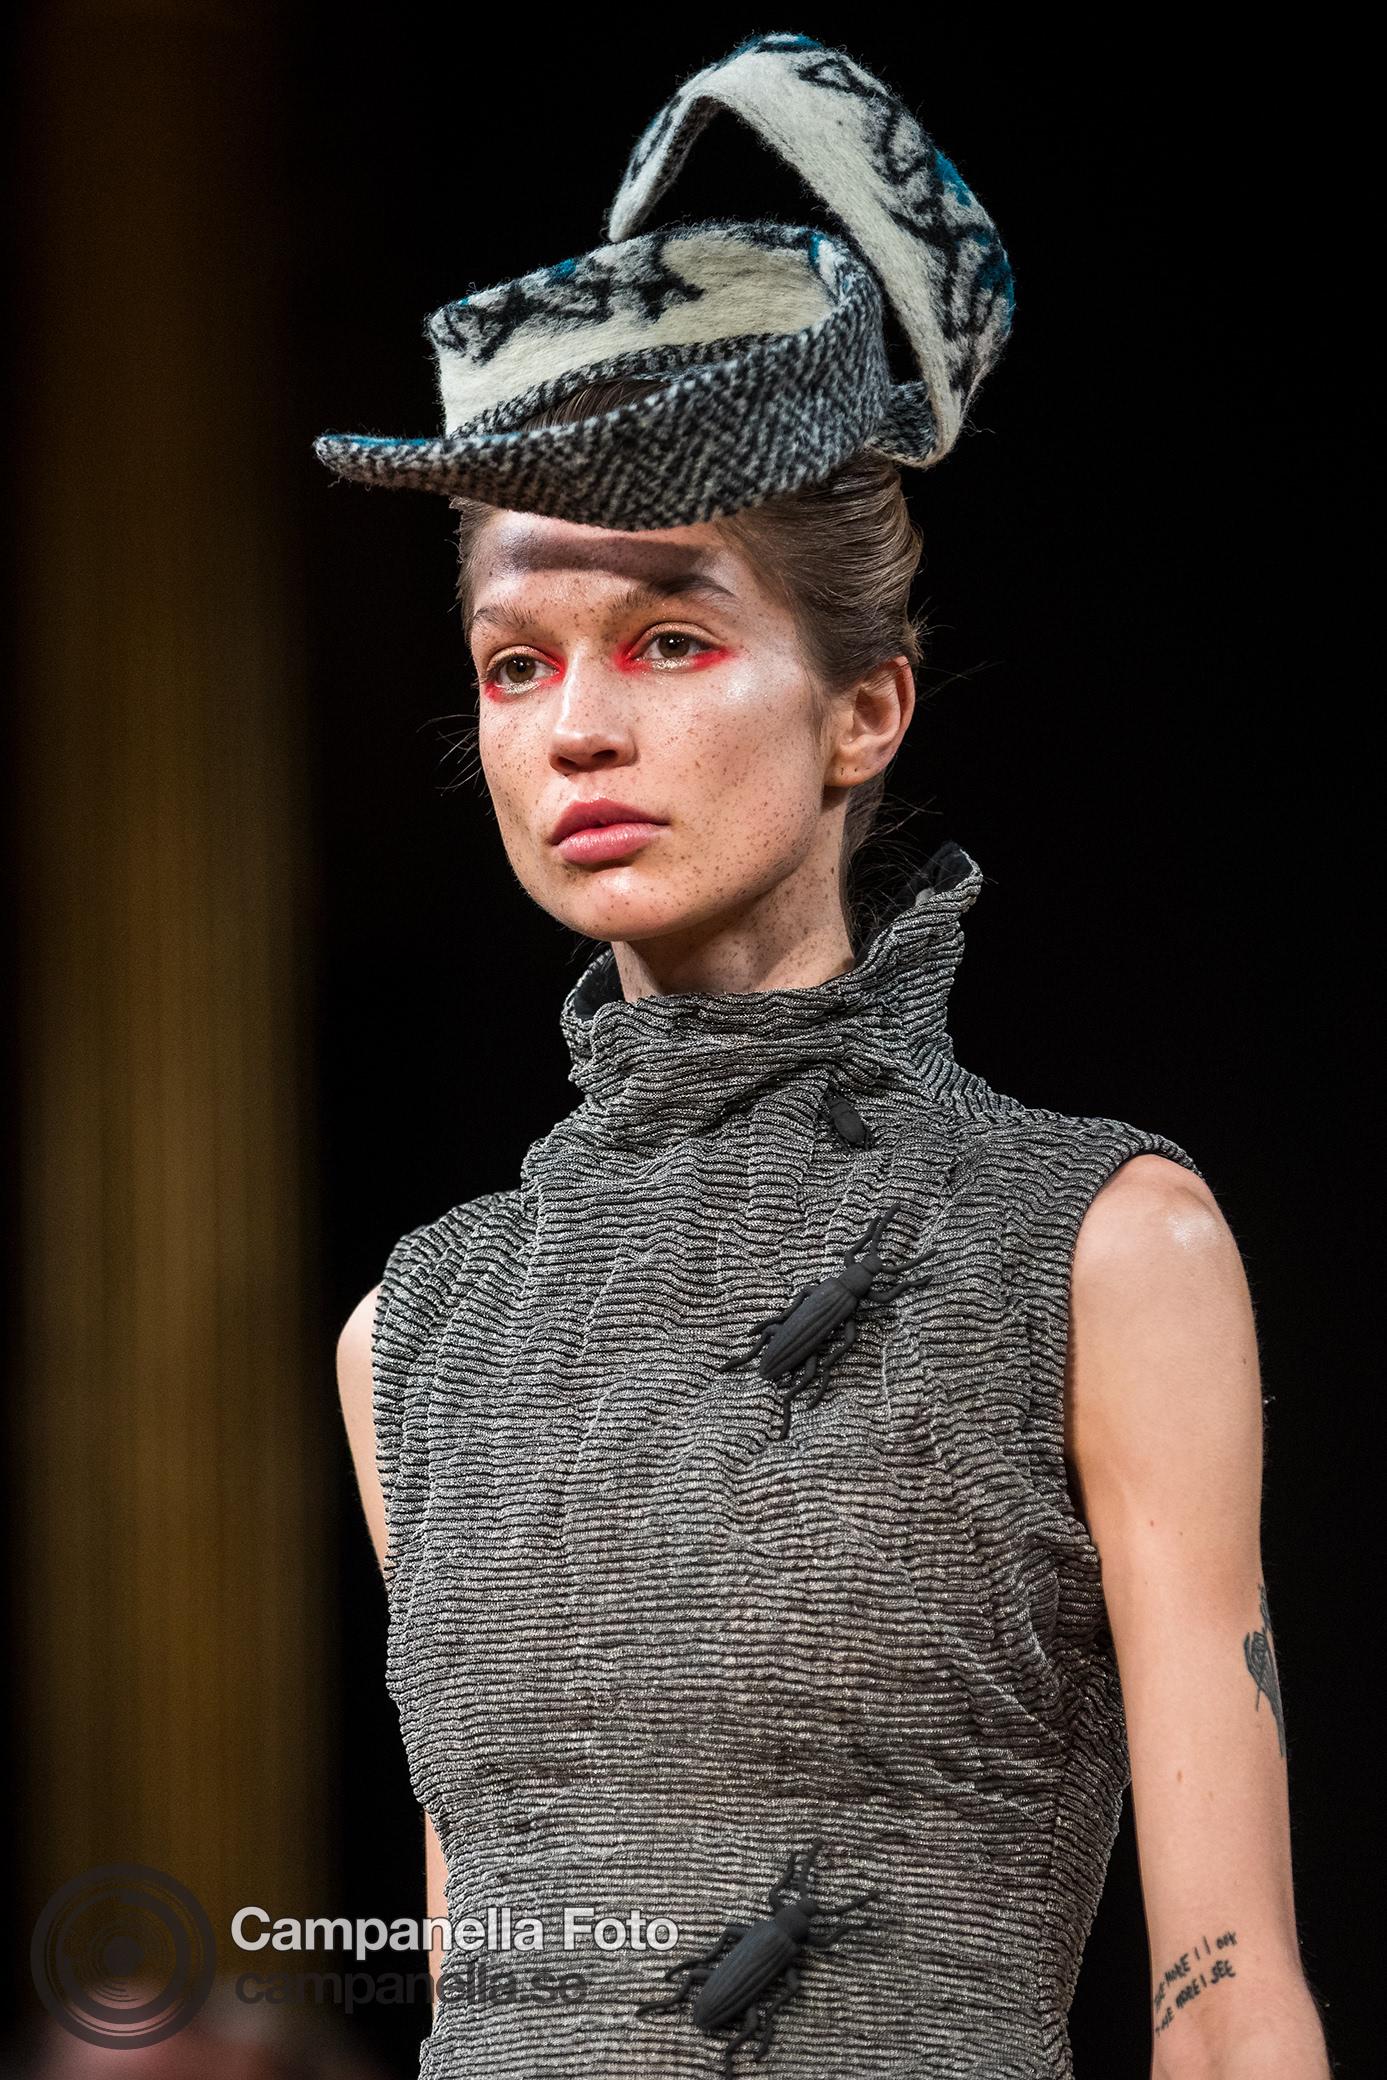 Fashion Week - Michael Campanella Photography